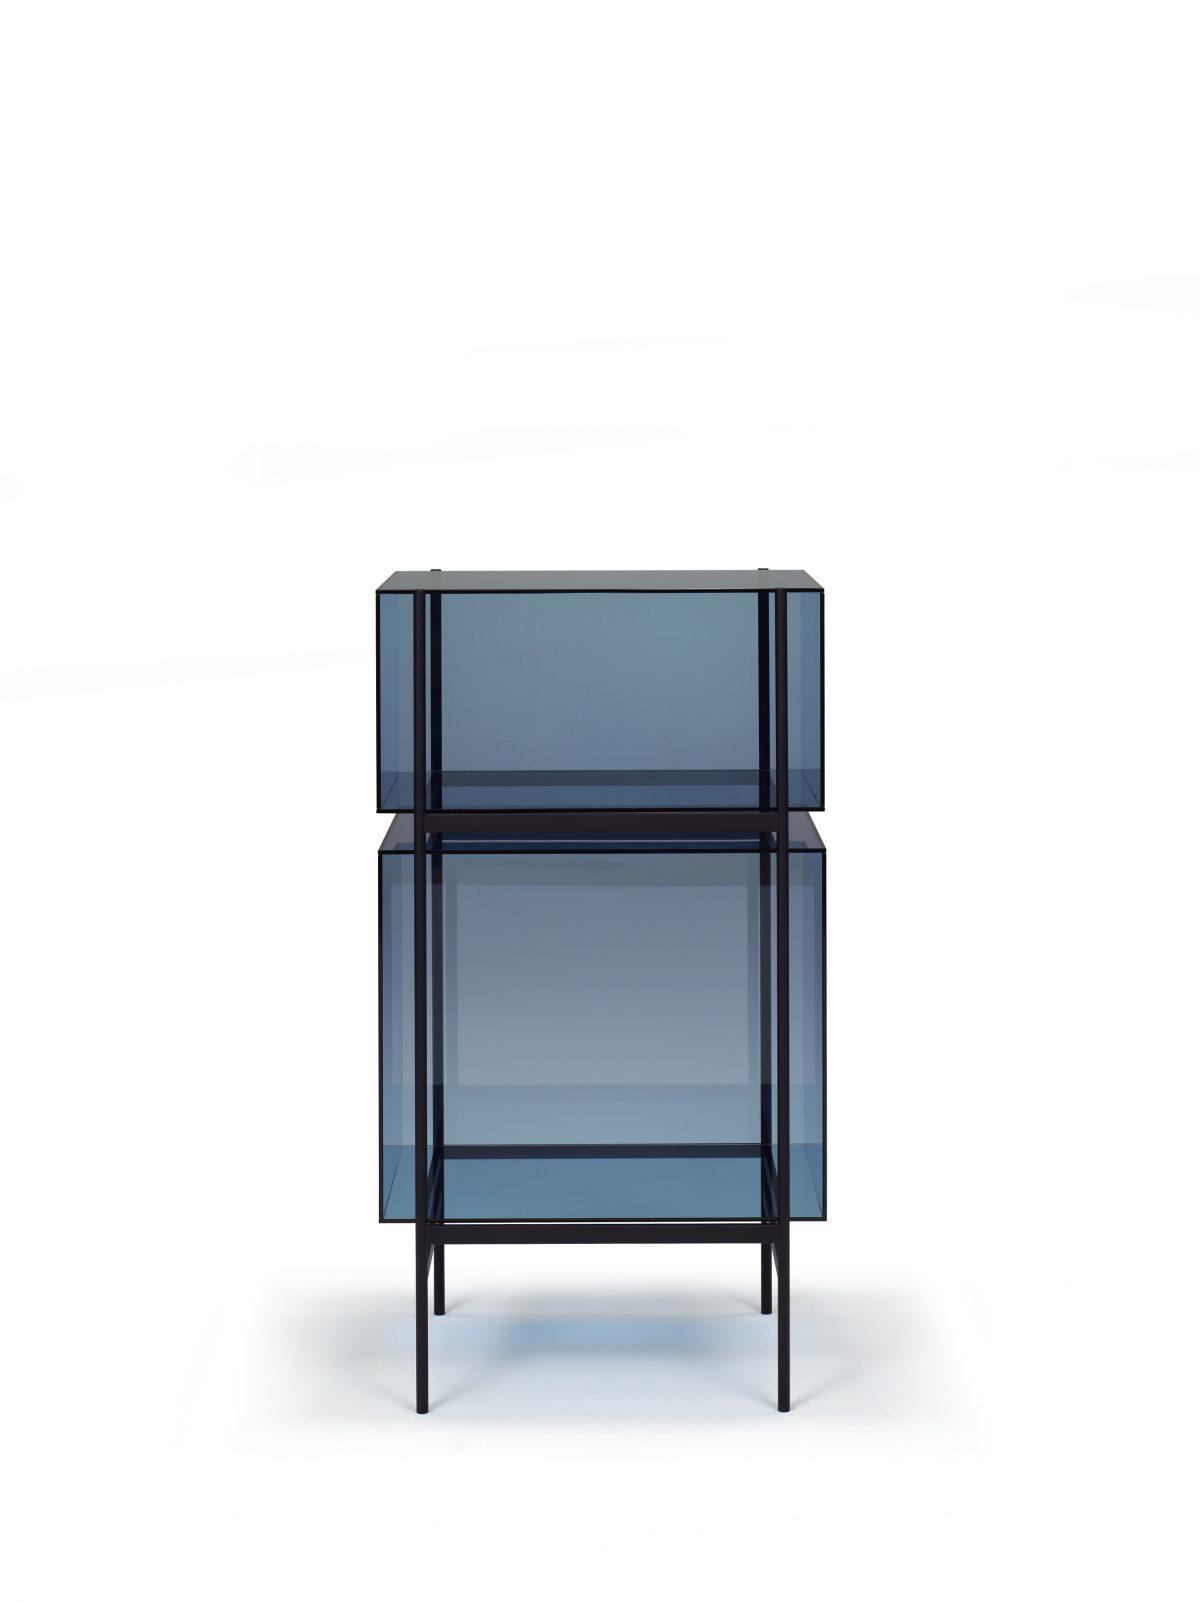 Kast LYN 2 Vakken Helderr Visser Meijwaard Exclusief Dutchdesign Zwart Frame Groen Glas JOSHH& 11